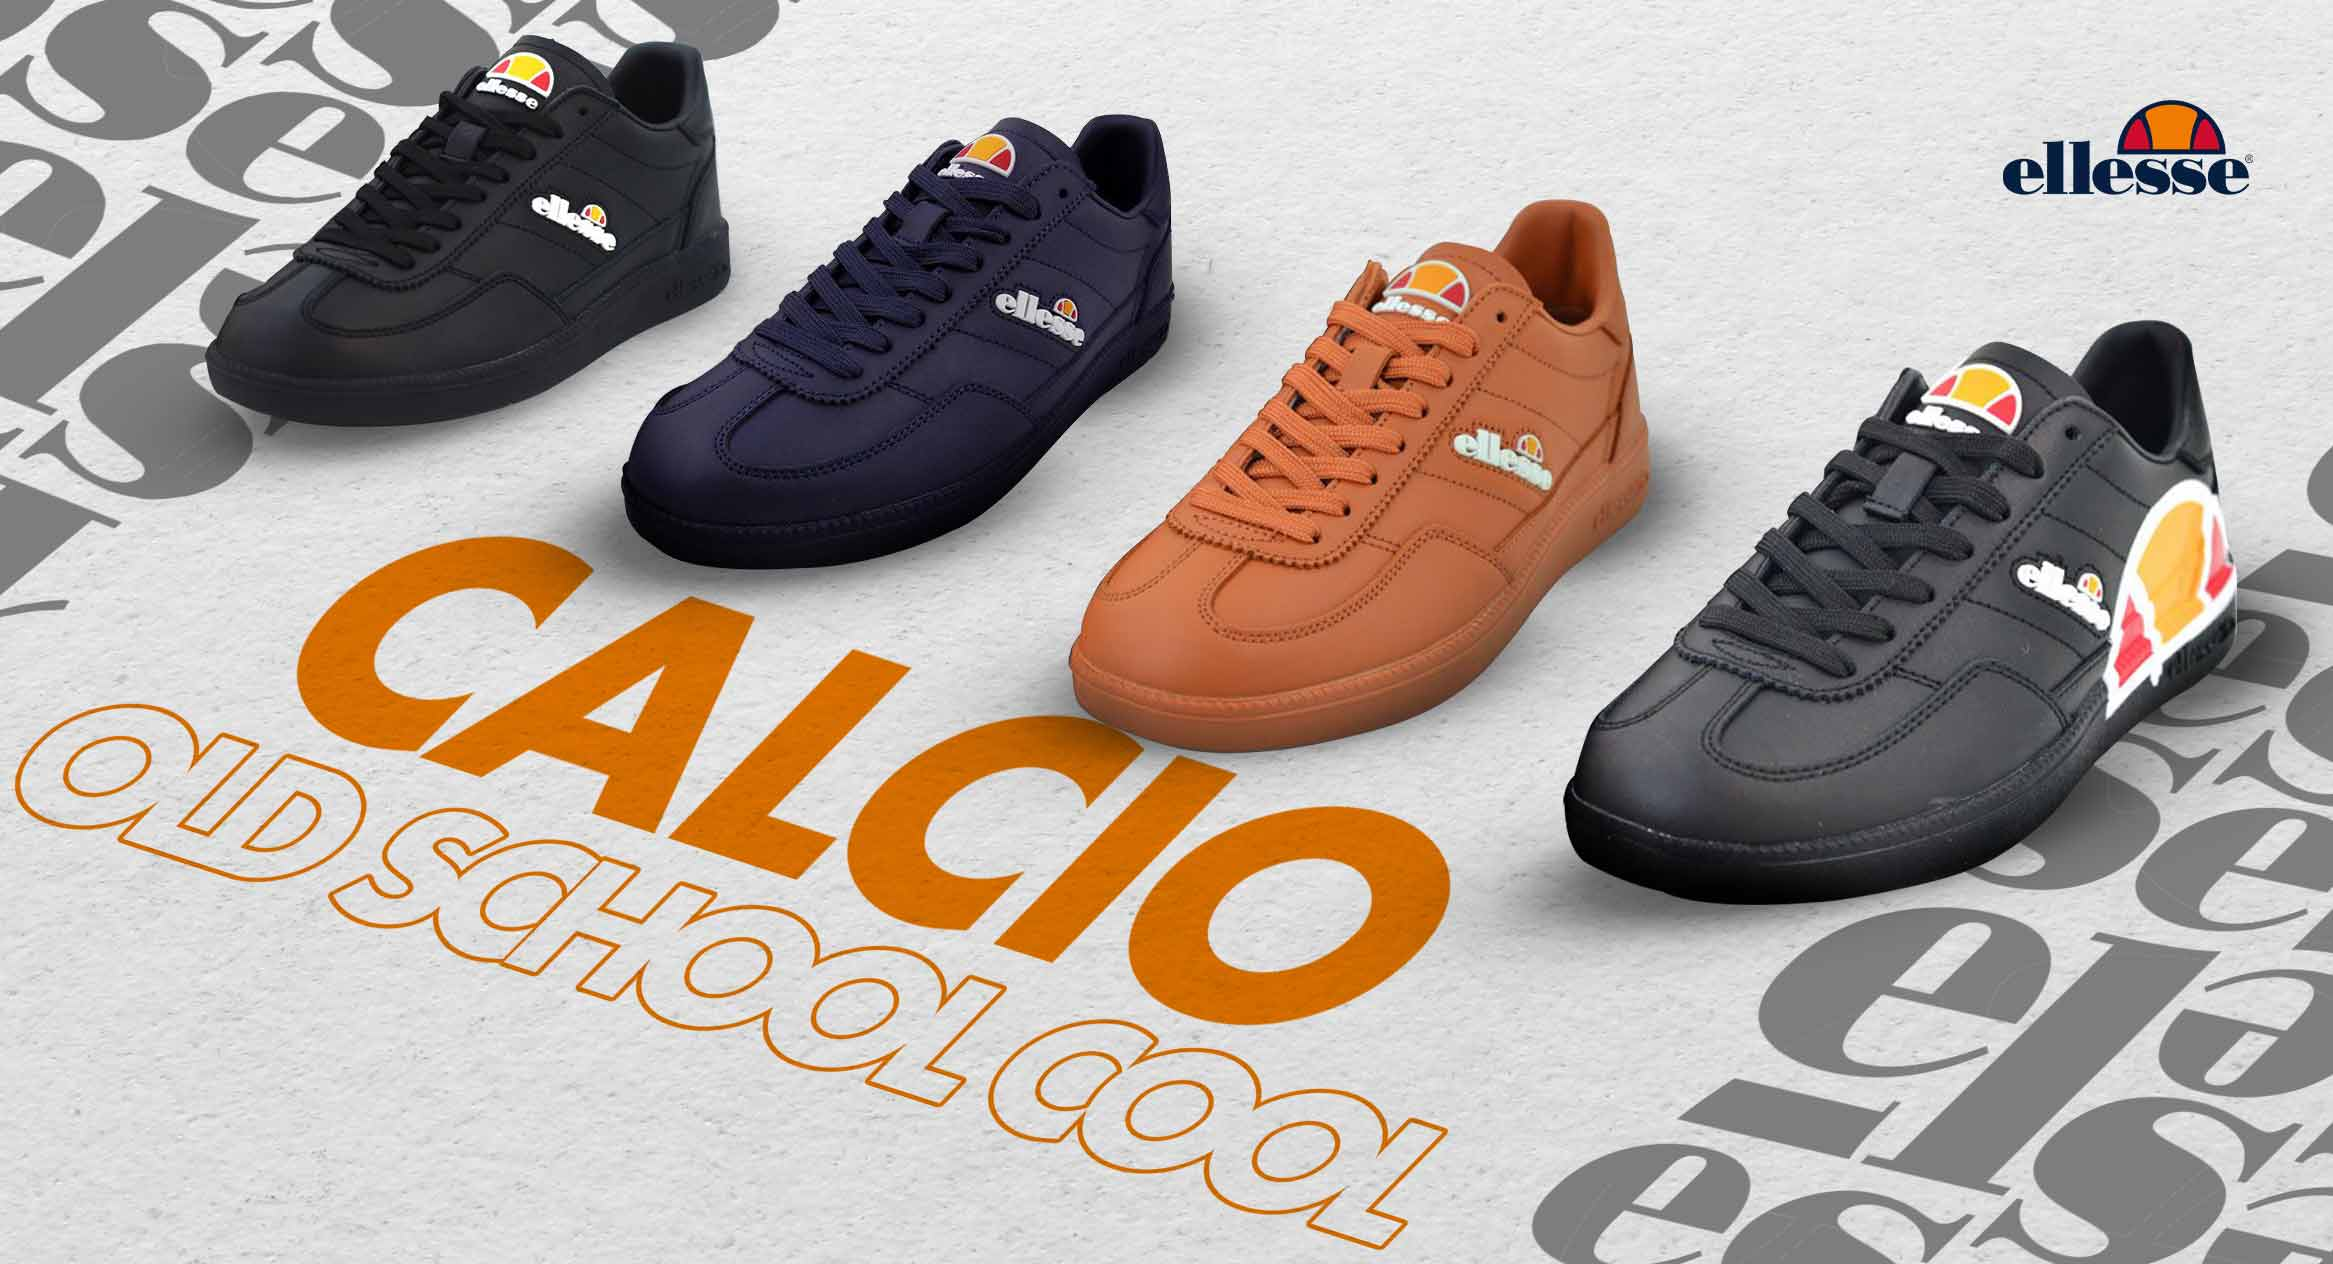 Old School Cool - the ellesse Calcio Sneaker